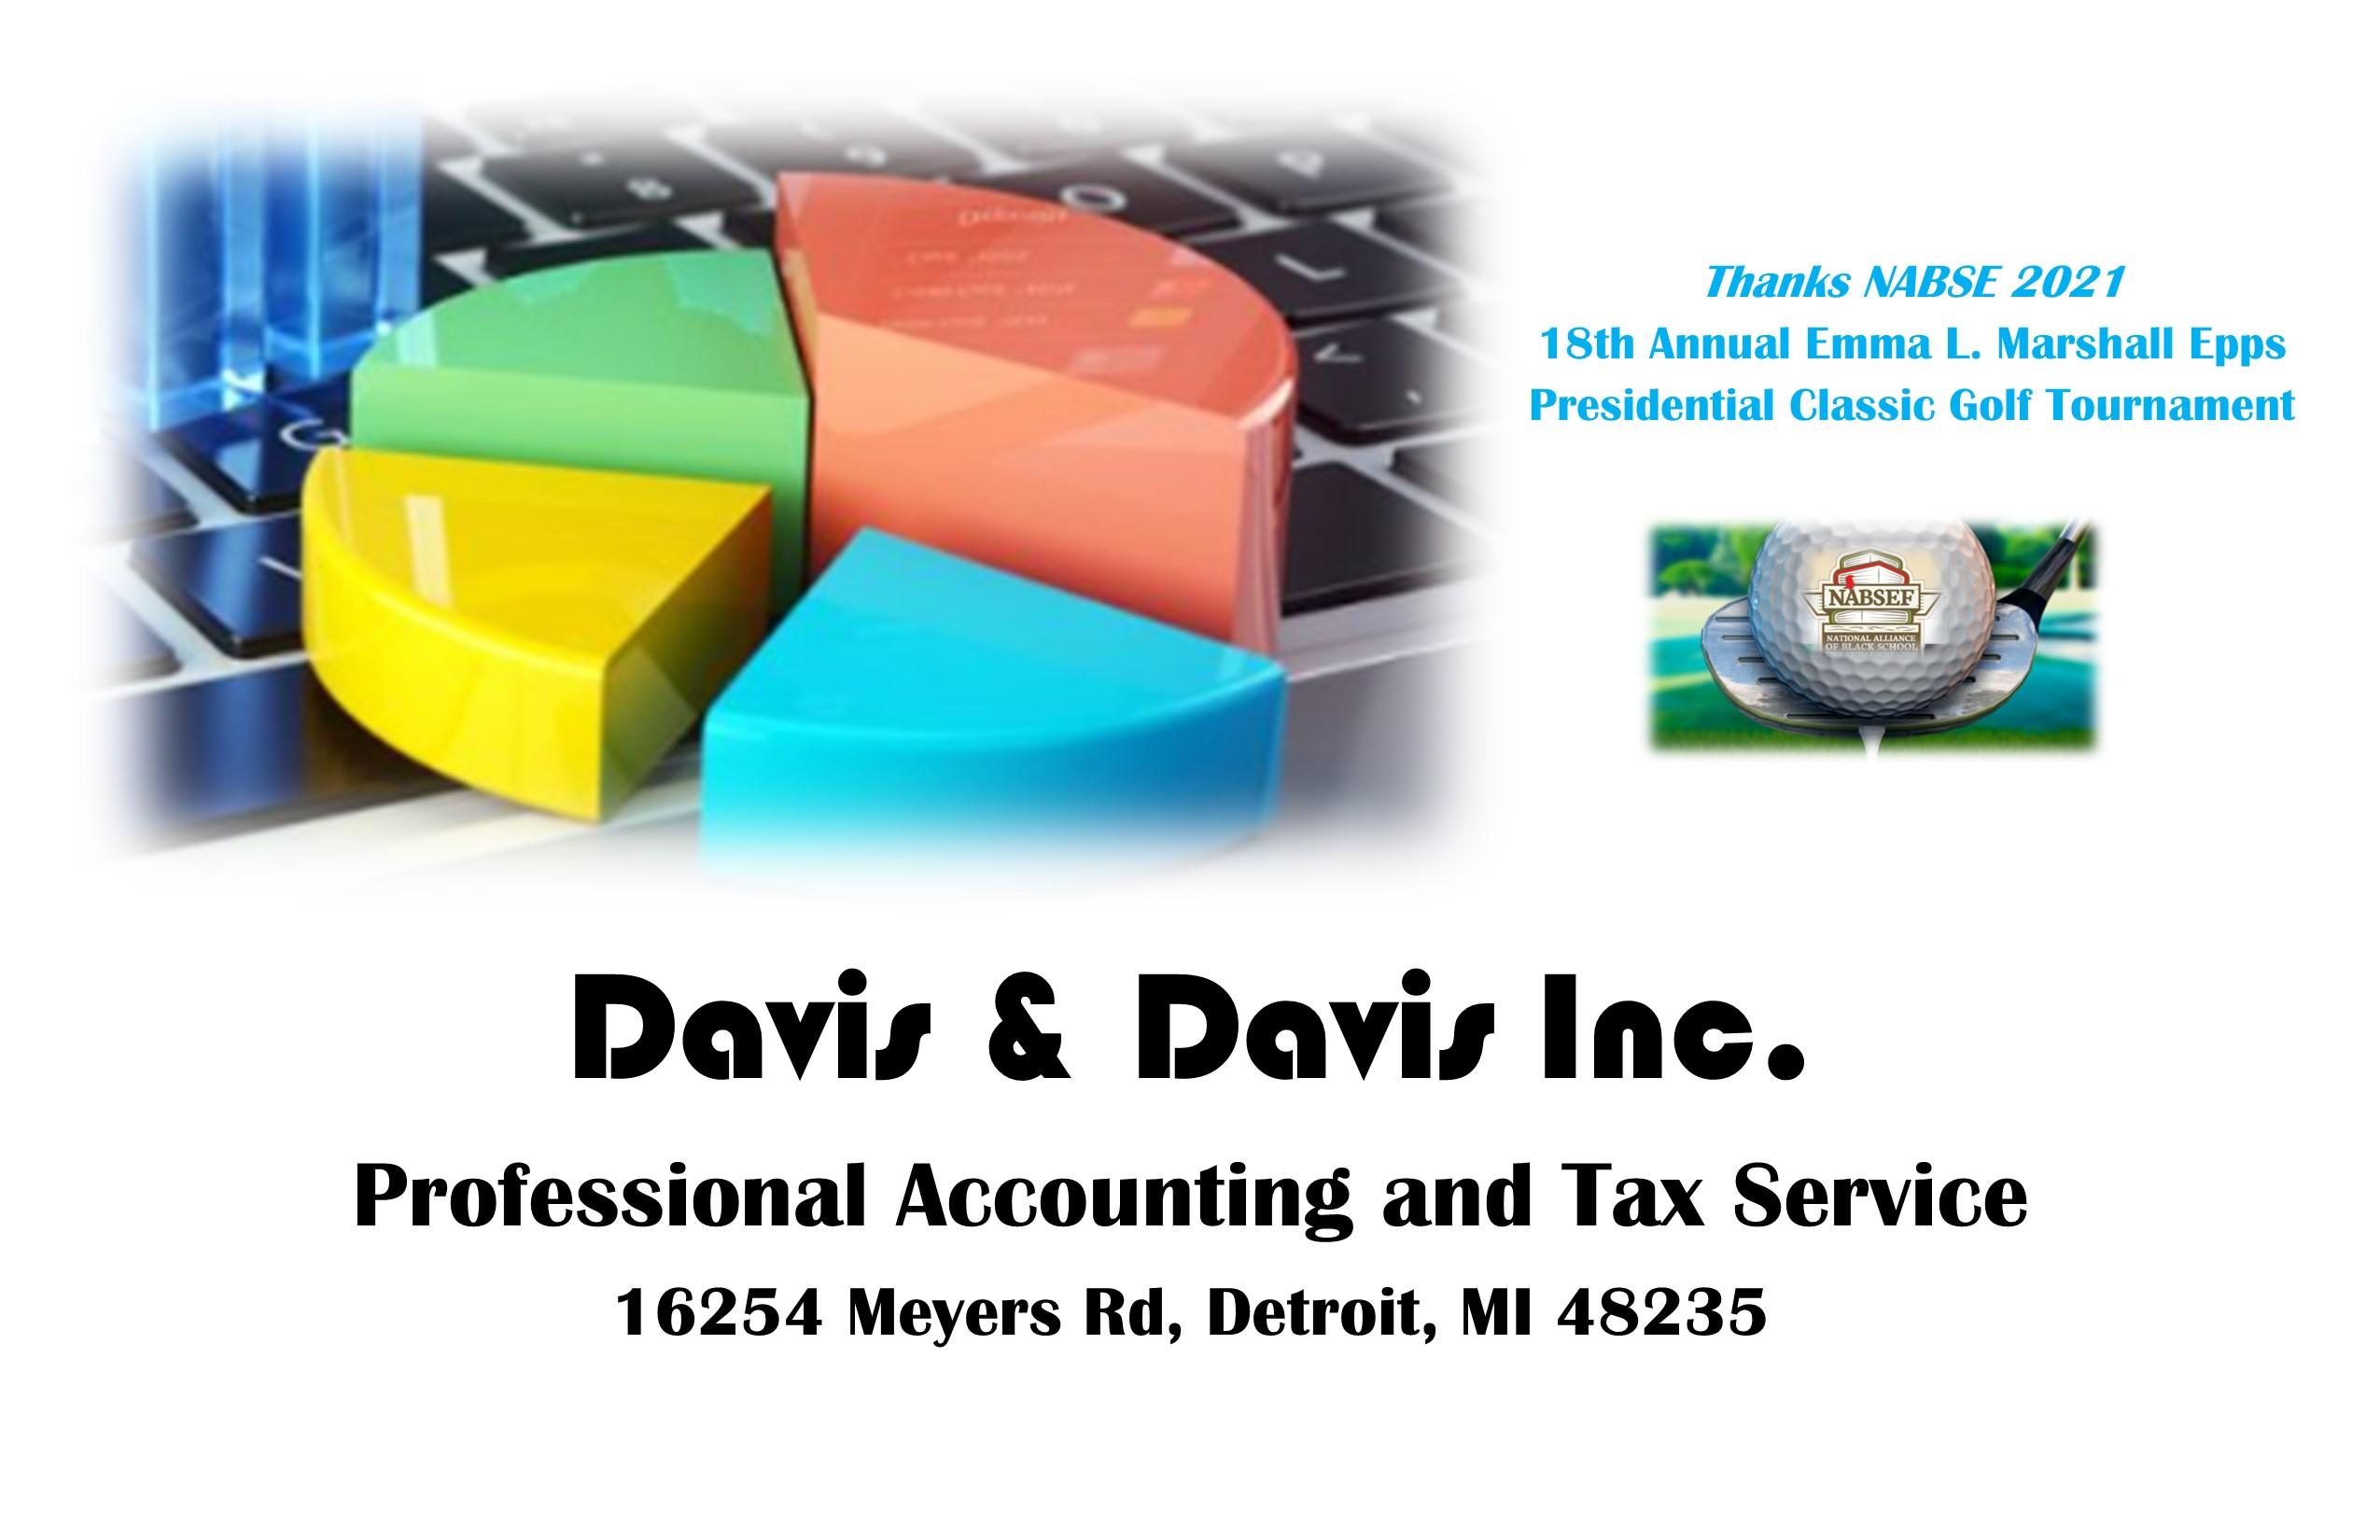 Davis & Davis Professional Accounting Services